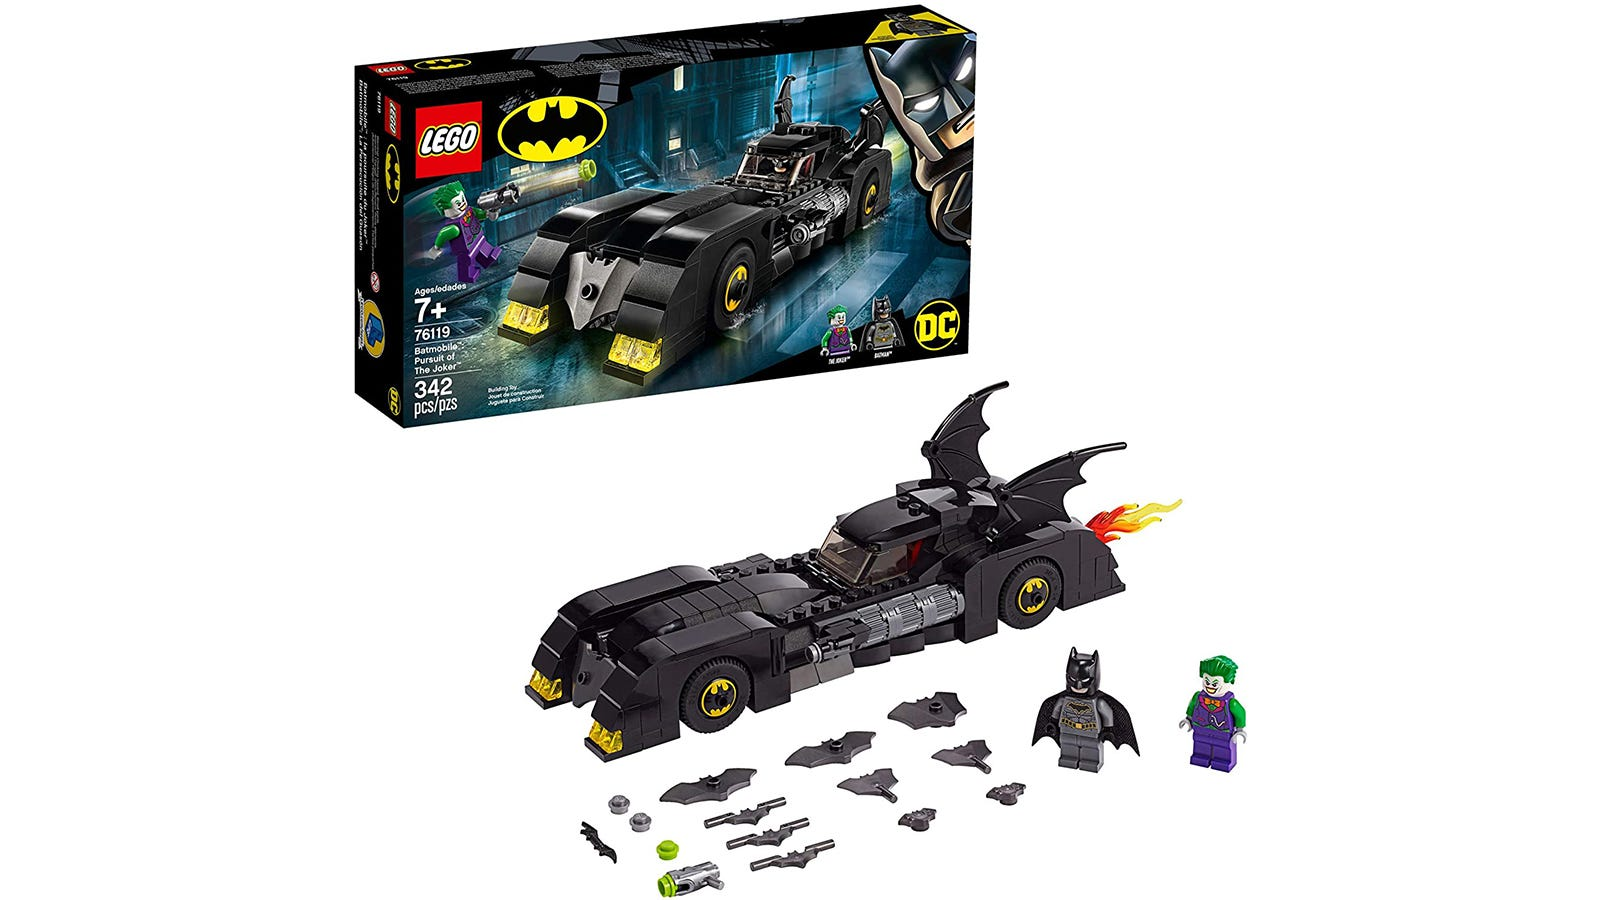 LEGO DC Superheroes Batmobile: Pursuit of the Joker